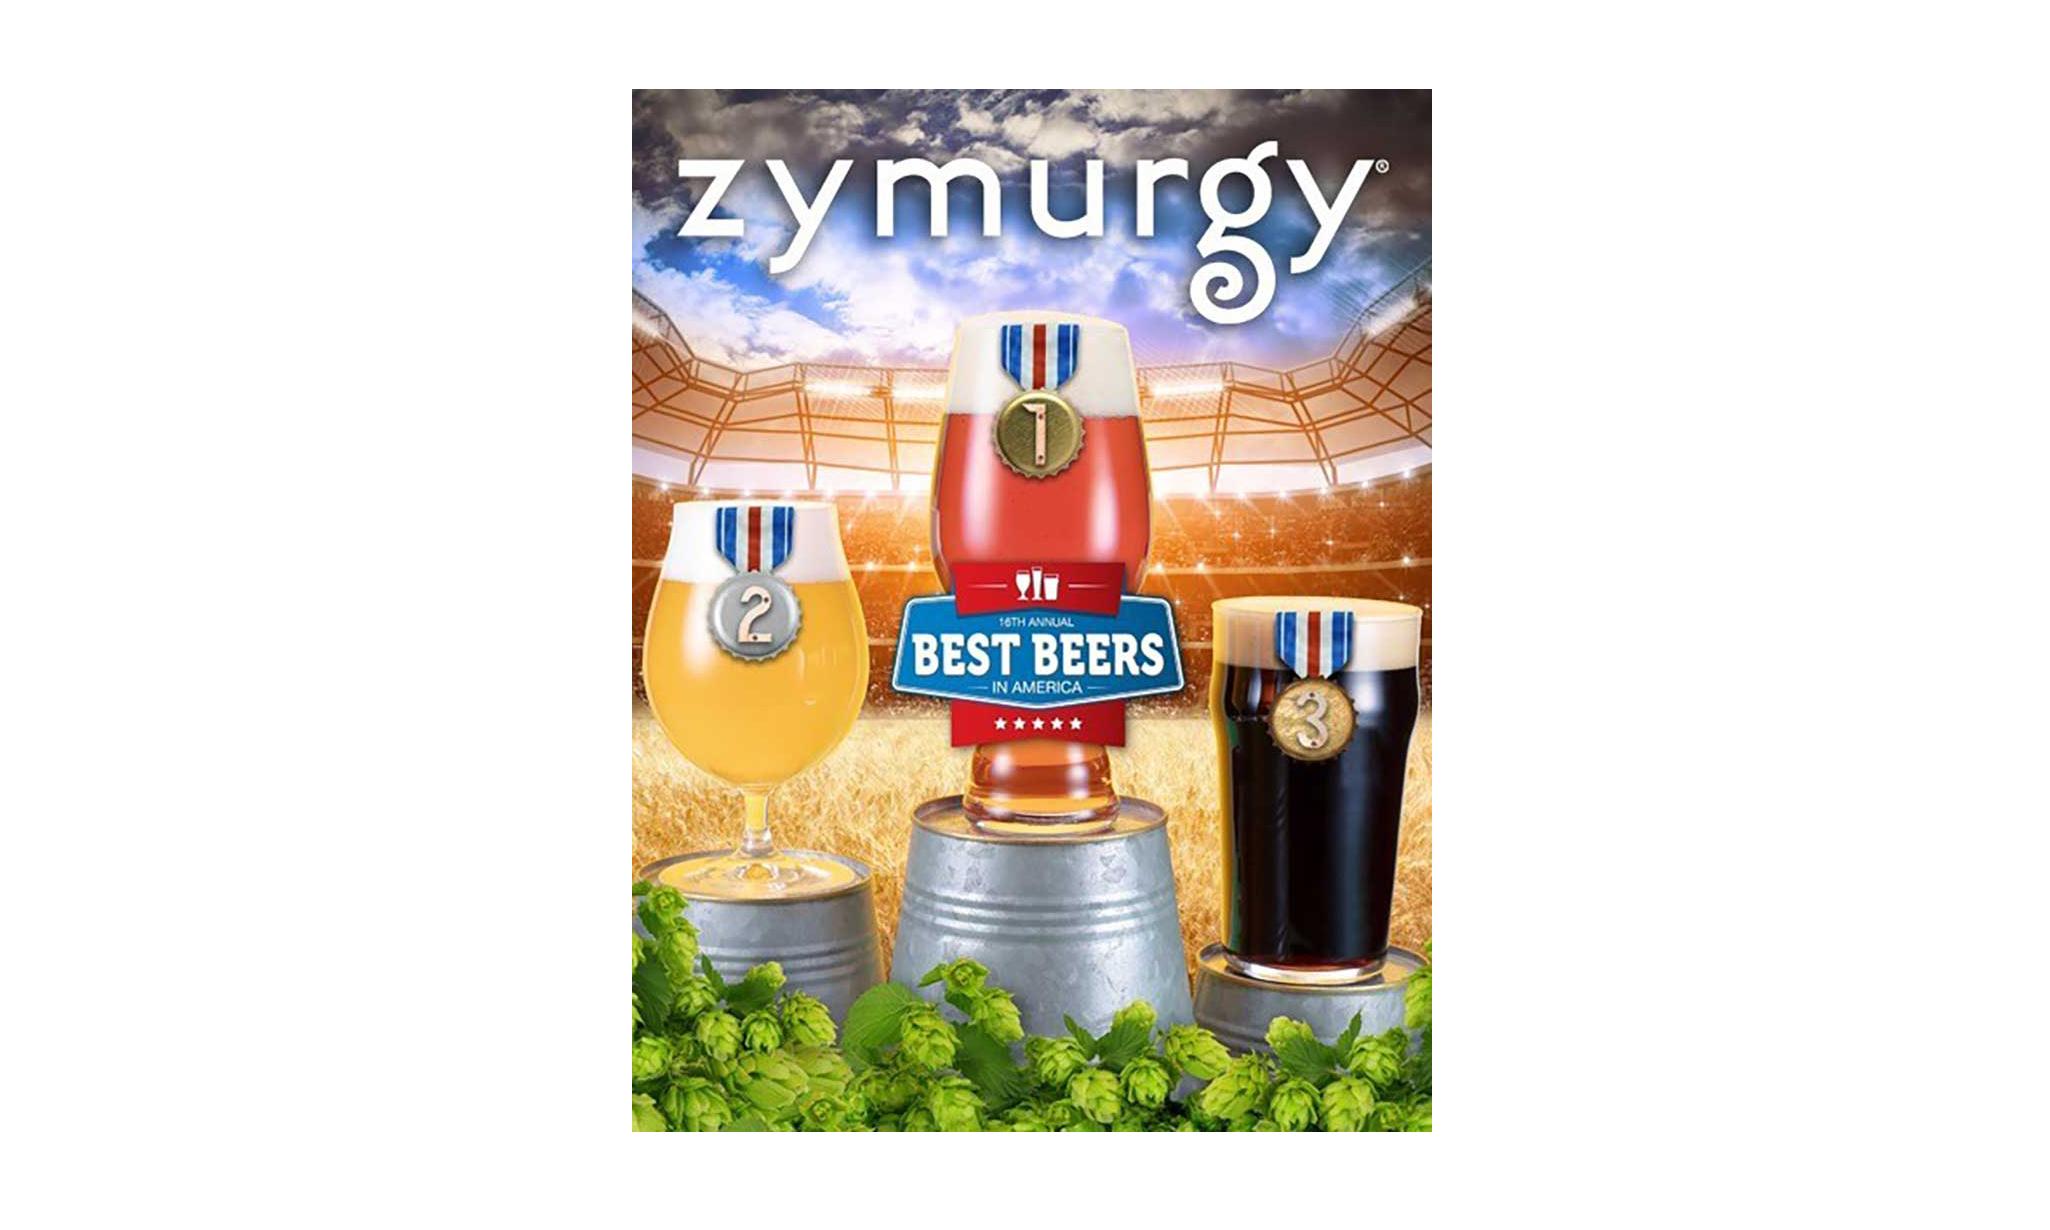 Zymurgy Best Beers artwork